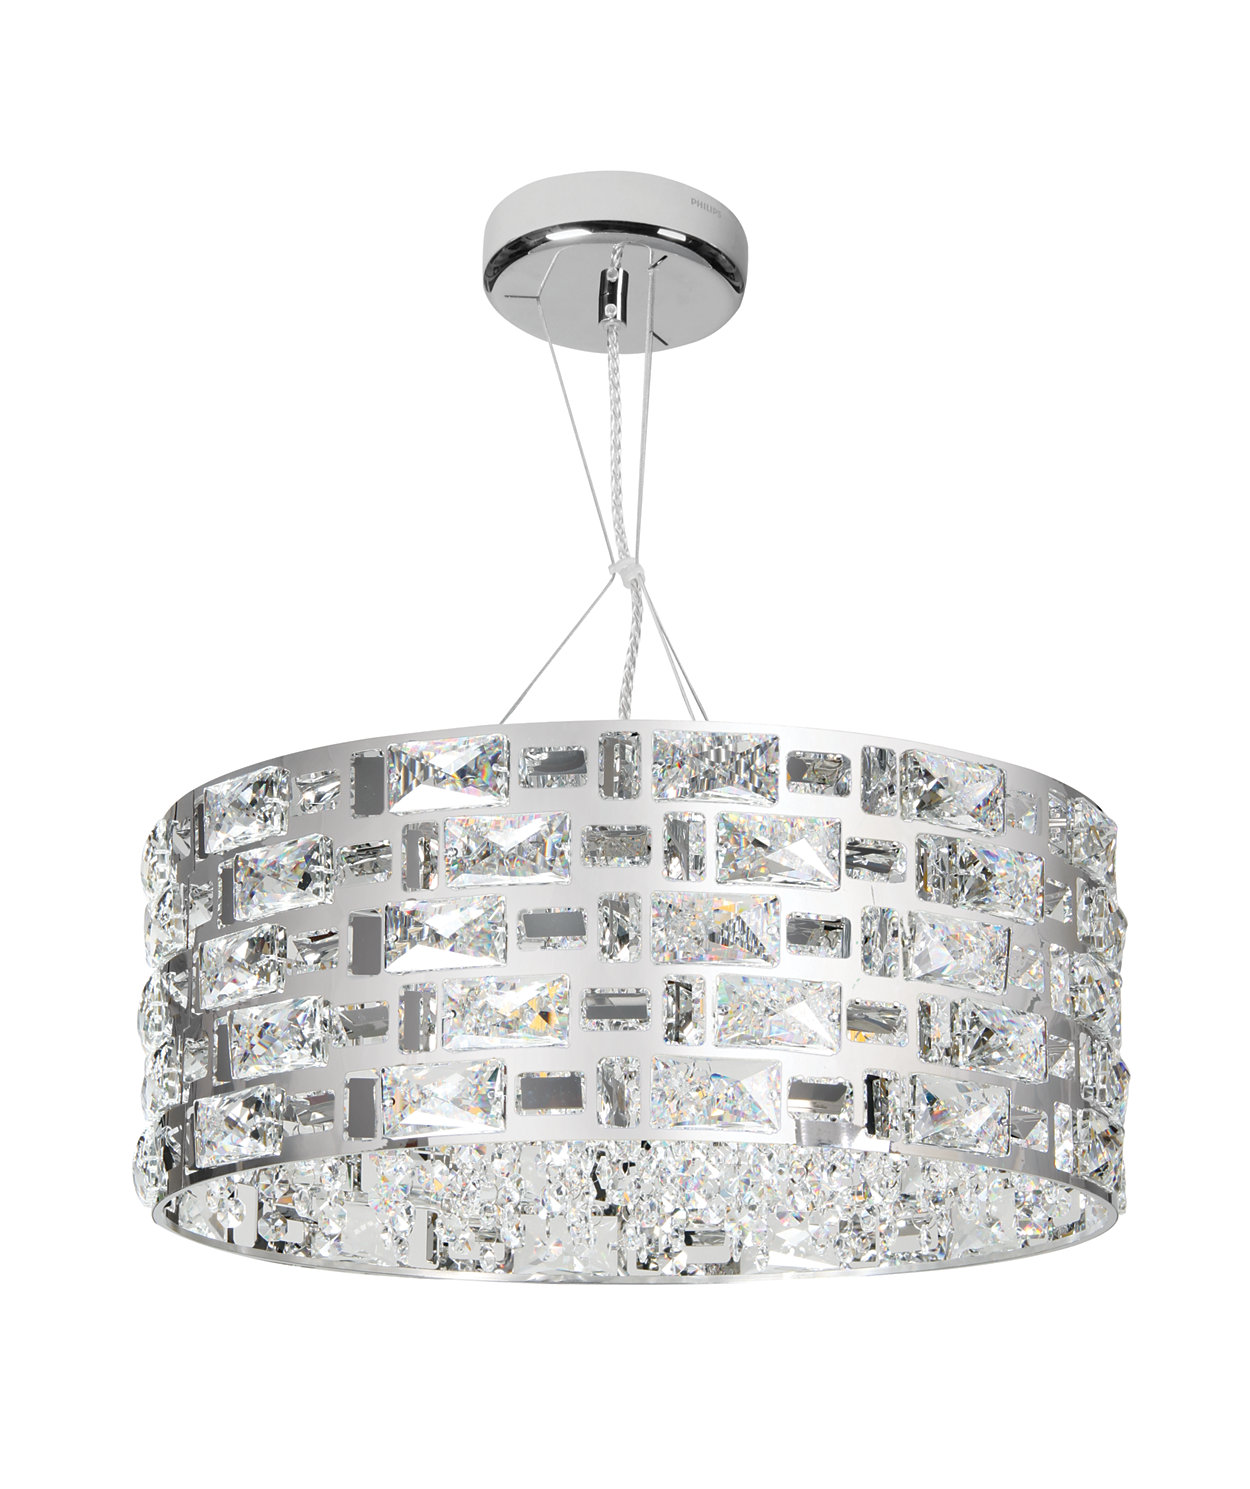 Contemporary design to compliment home décor